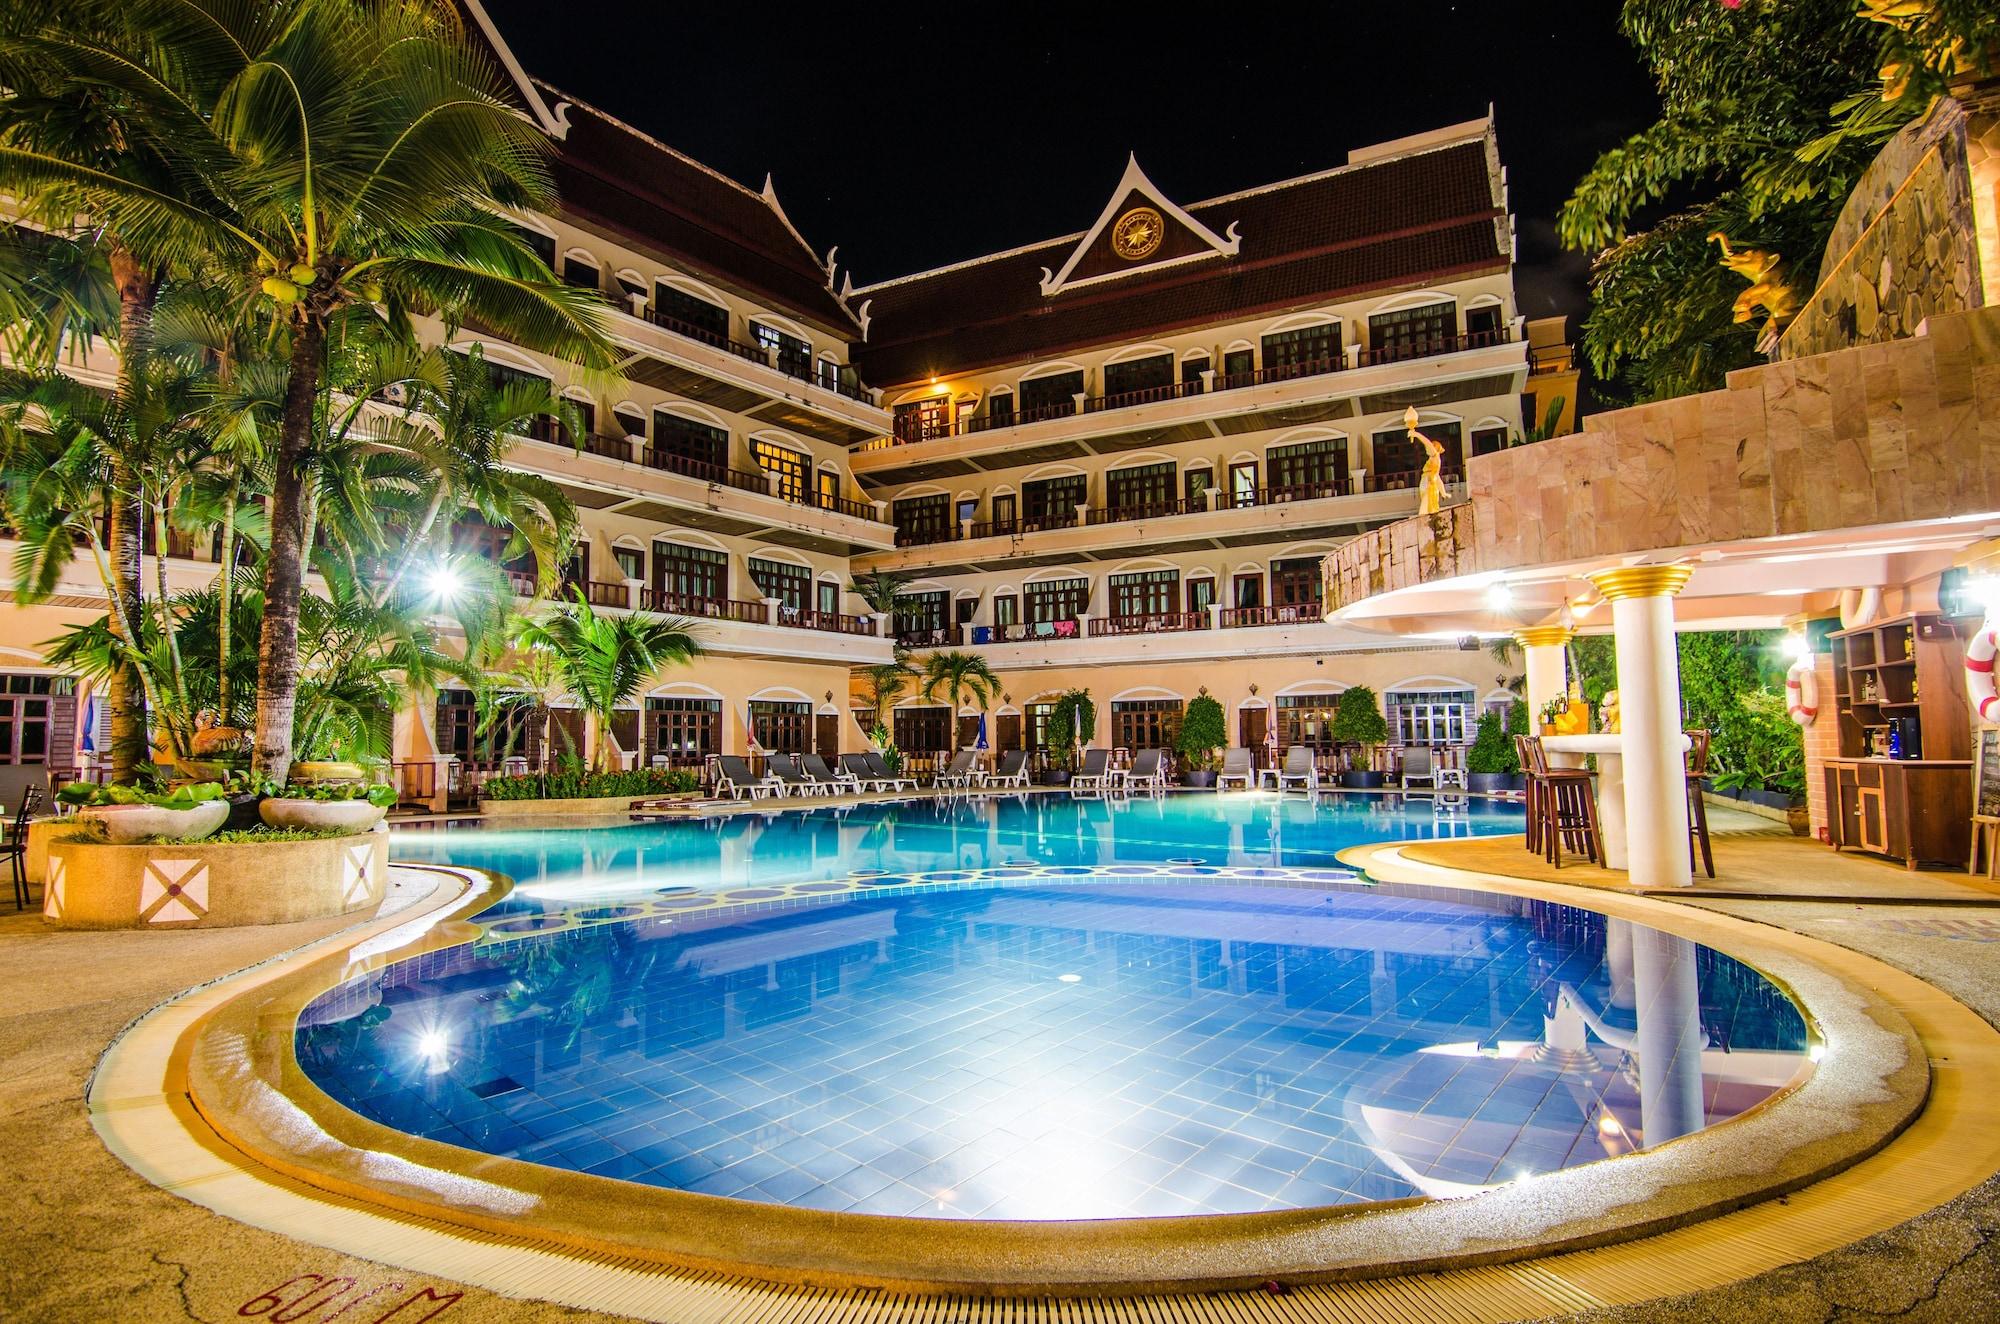 Tony Resort, Pulau Phuket